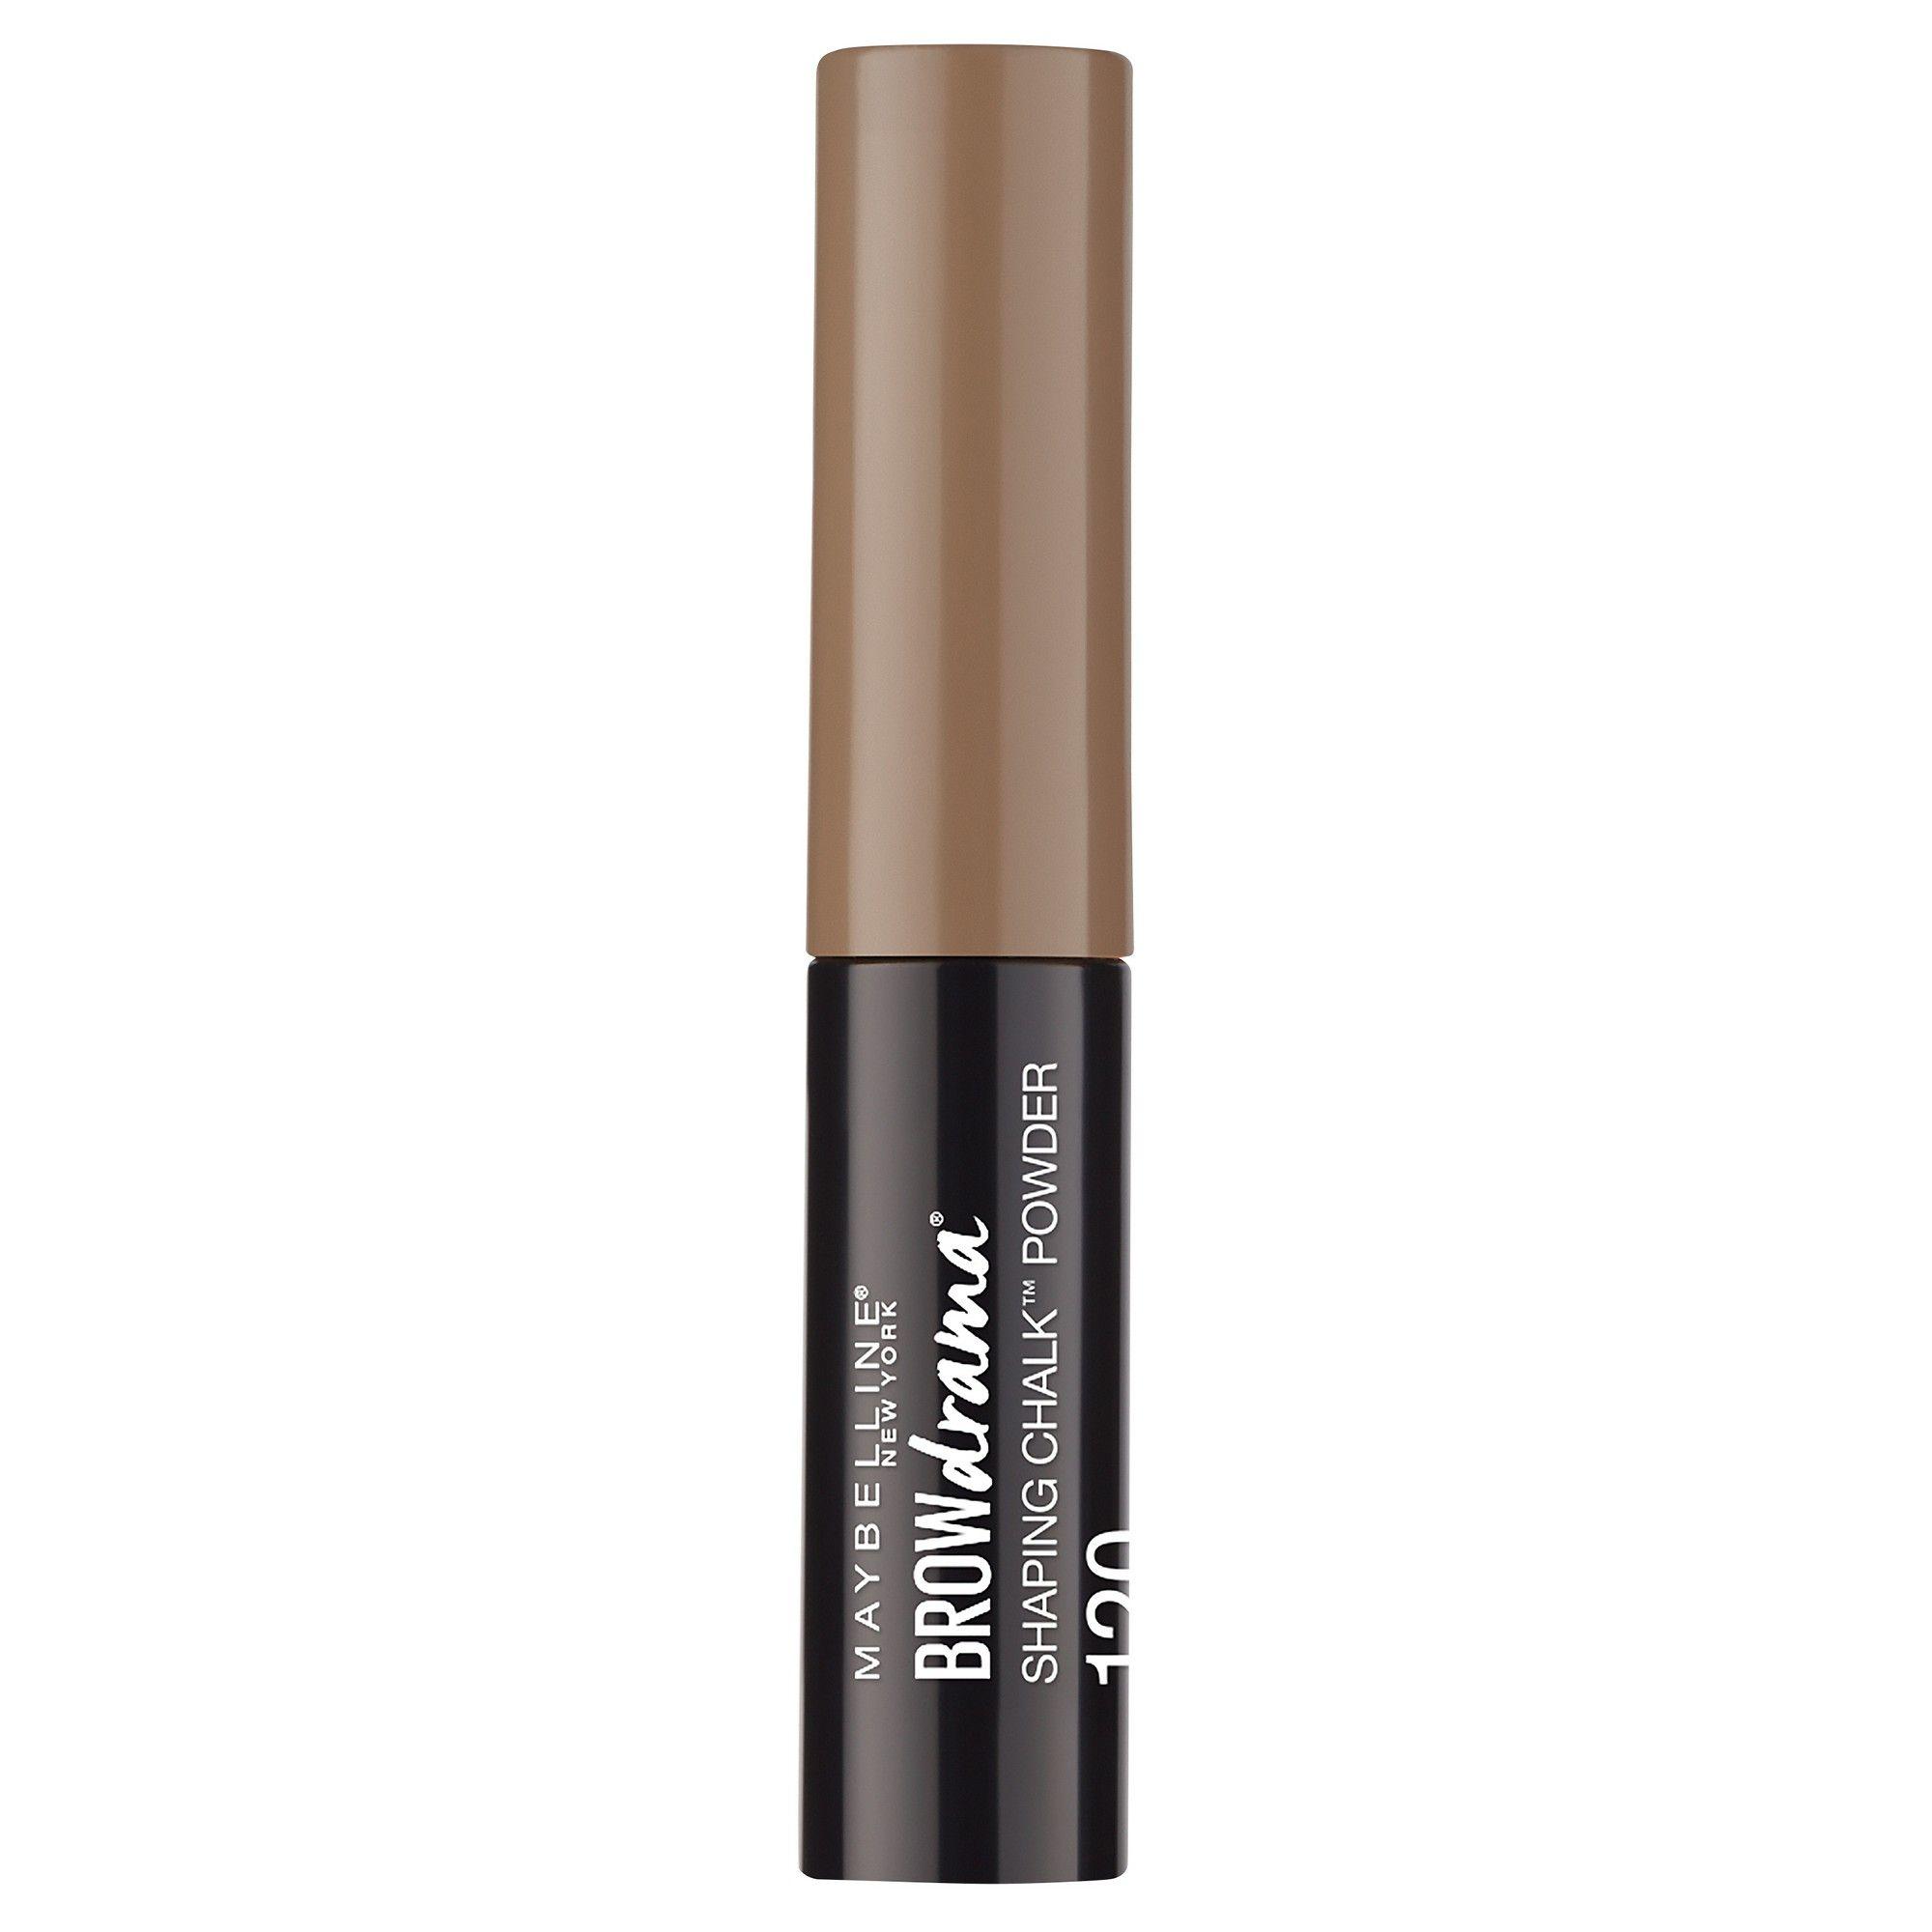 476cf458d4e Maybelline Eye Studio Brow Drama Shaping Chalk Powder Medium Brown - 0.035oz